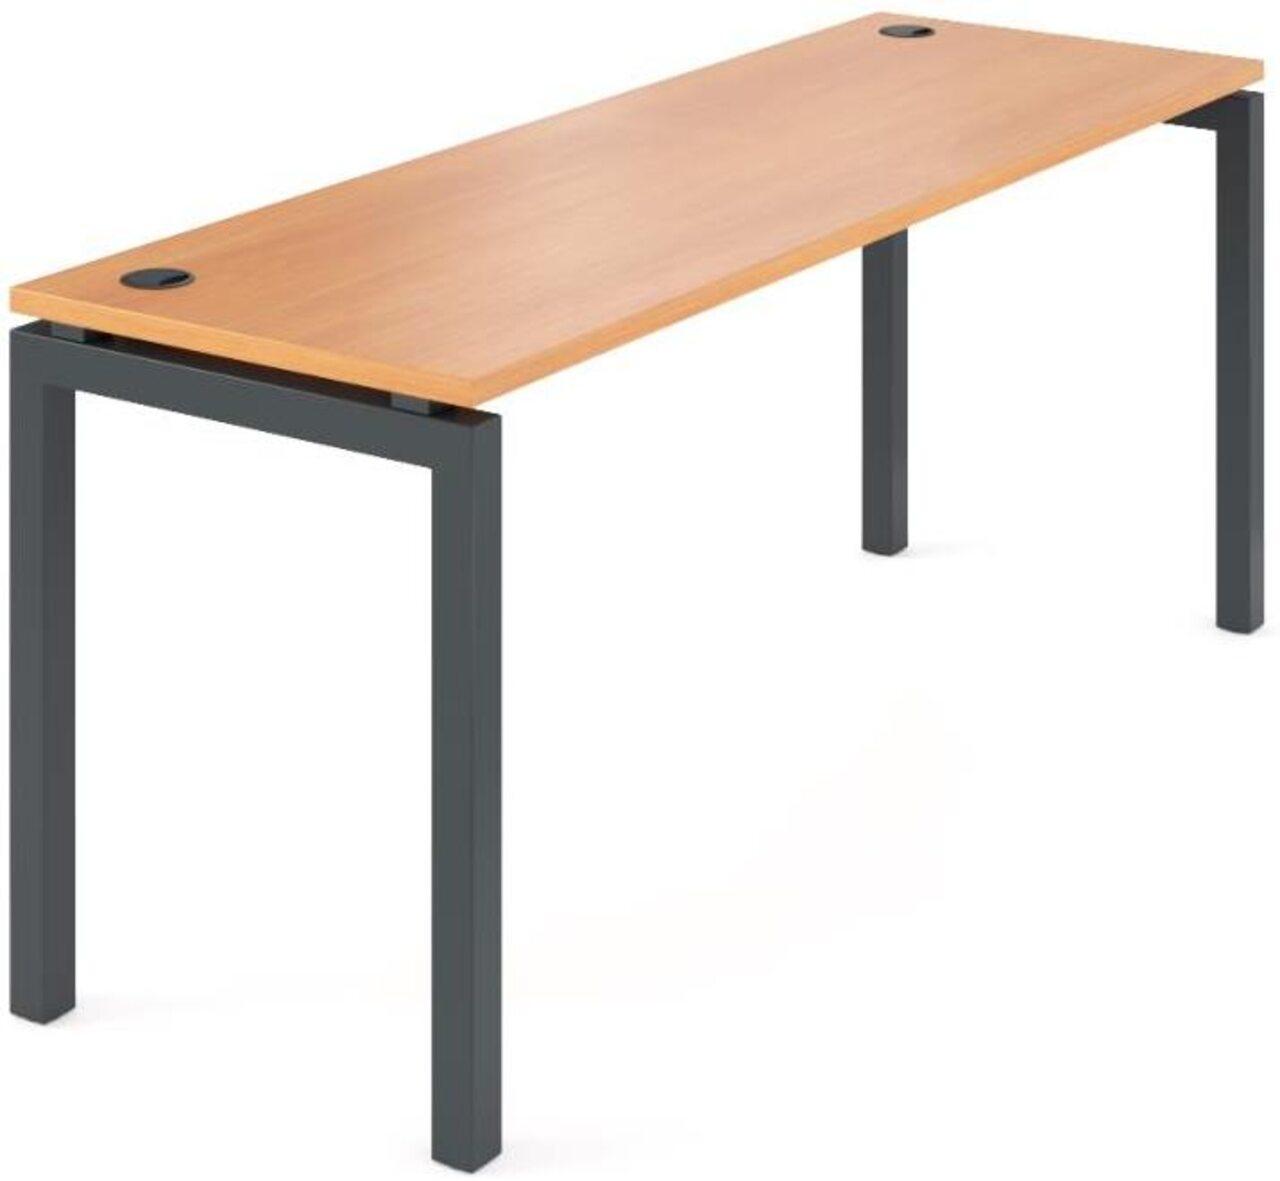 Стол на металлокаркасе  Арго 180x60x76 - фото 2